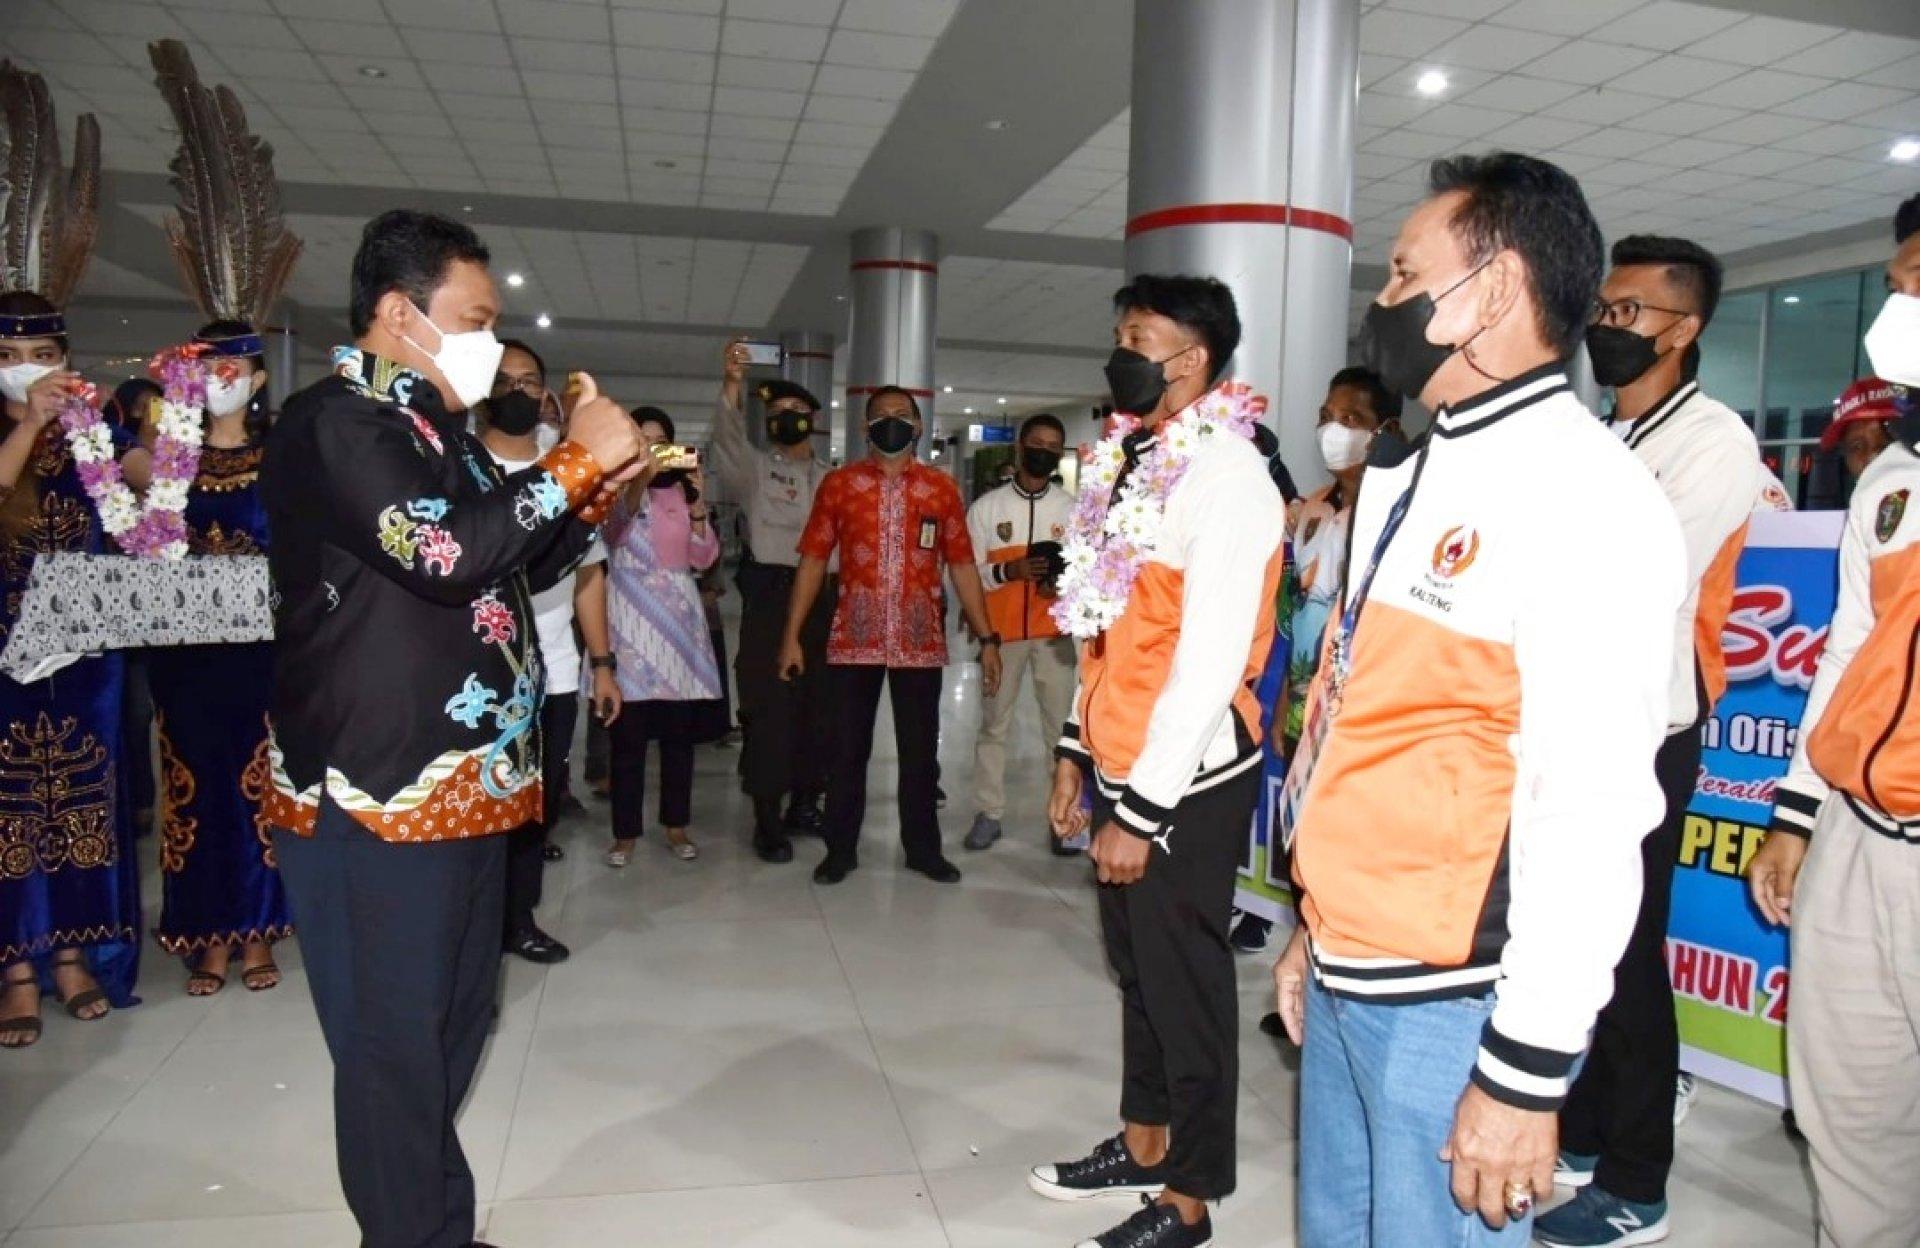 Wagub Edy Pratowo Sambut Kepulangan Atlet Cabor Atletik Kalteng dari PON XX Papua